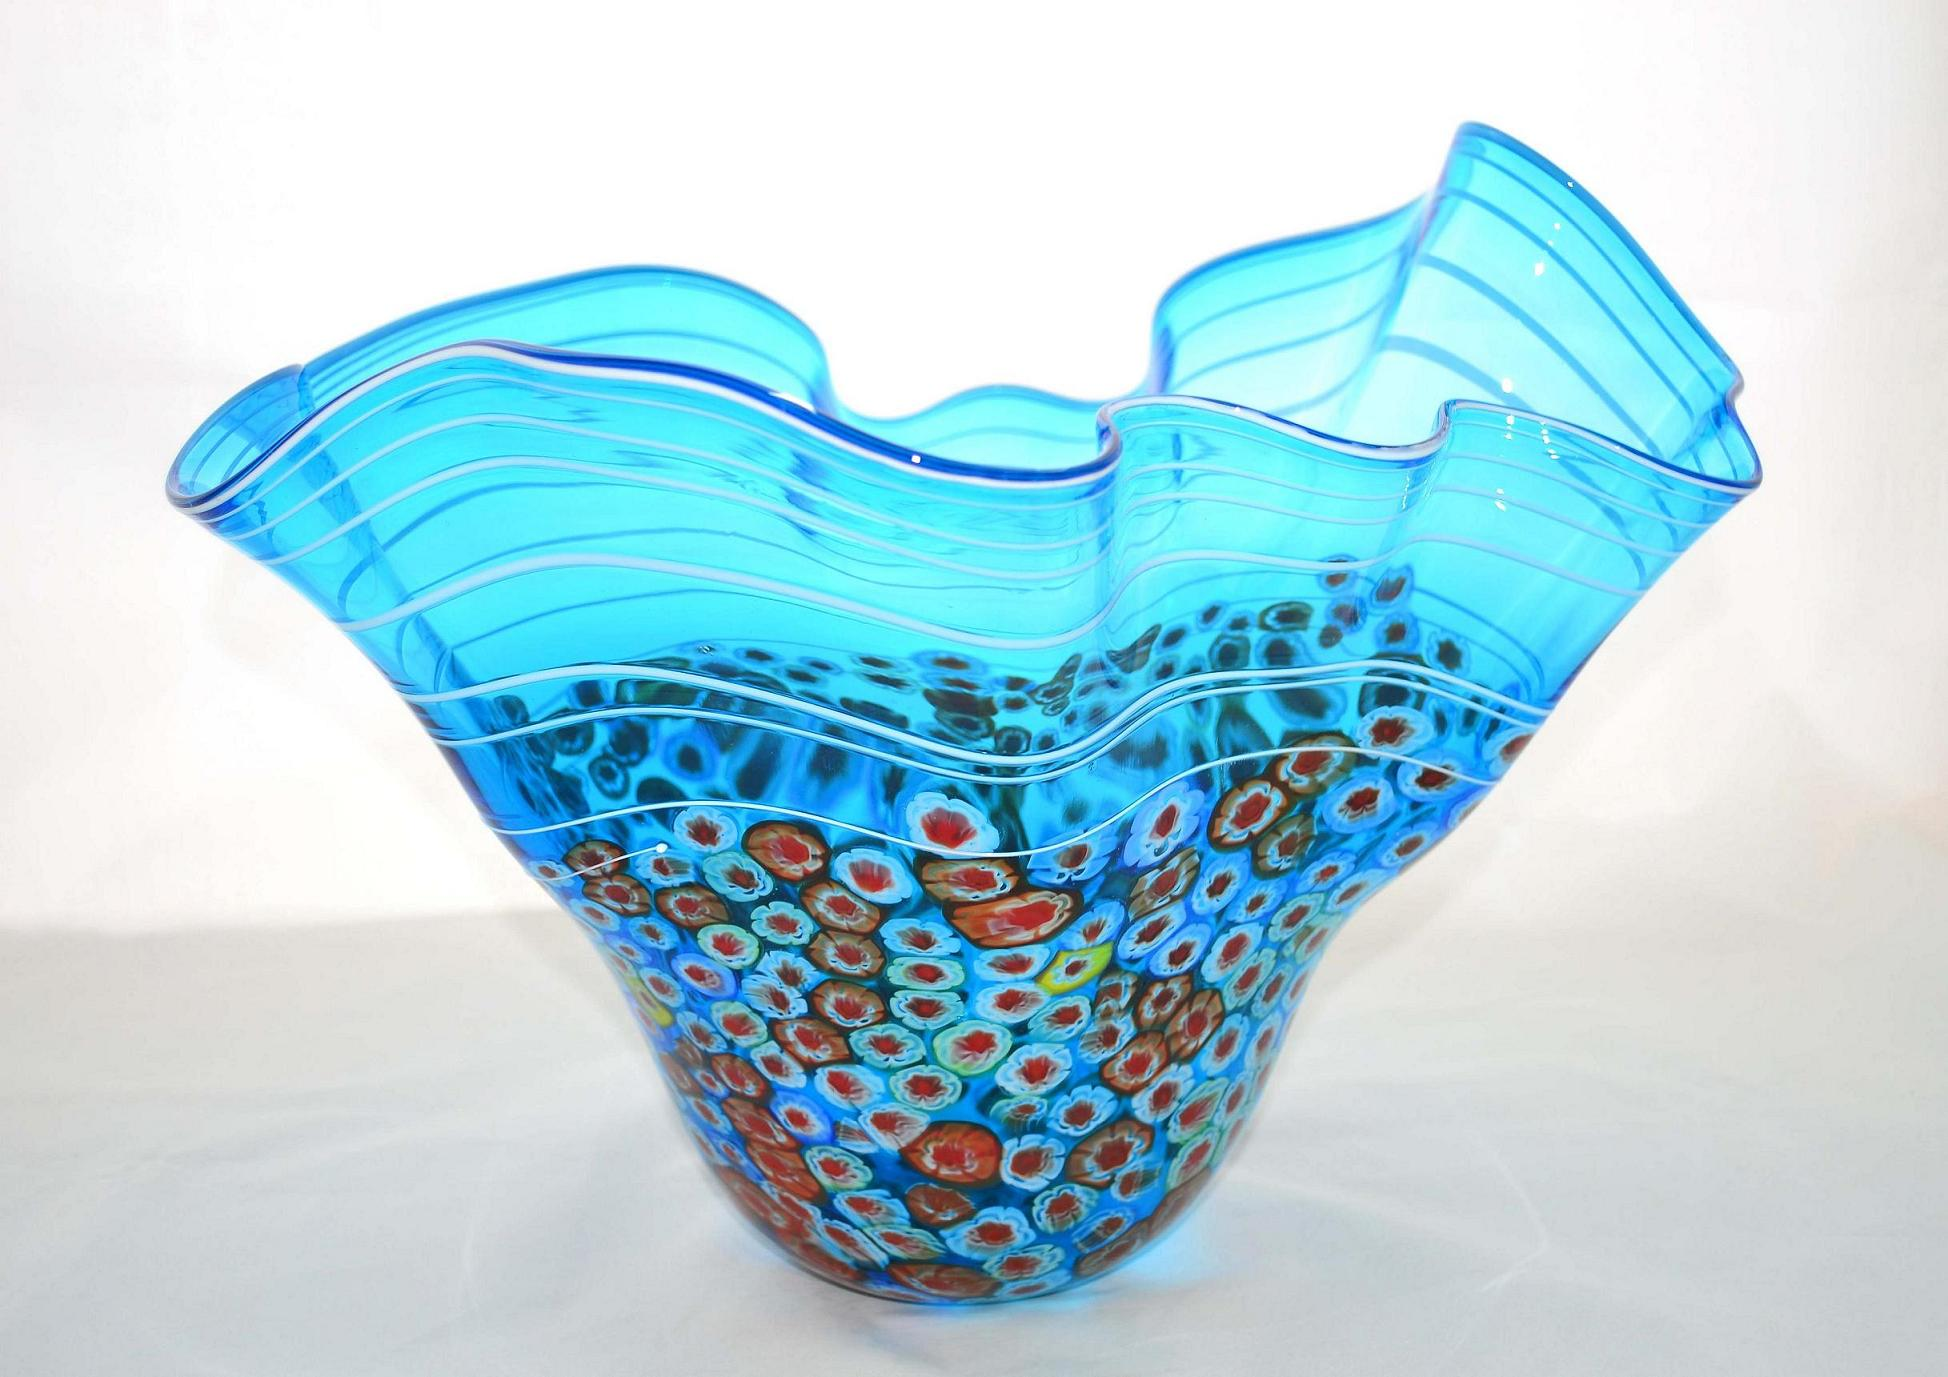 Murano Glass Appraisal Nugent Appraisal Services